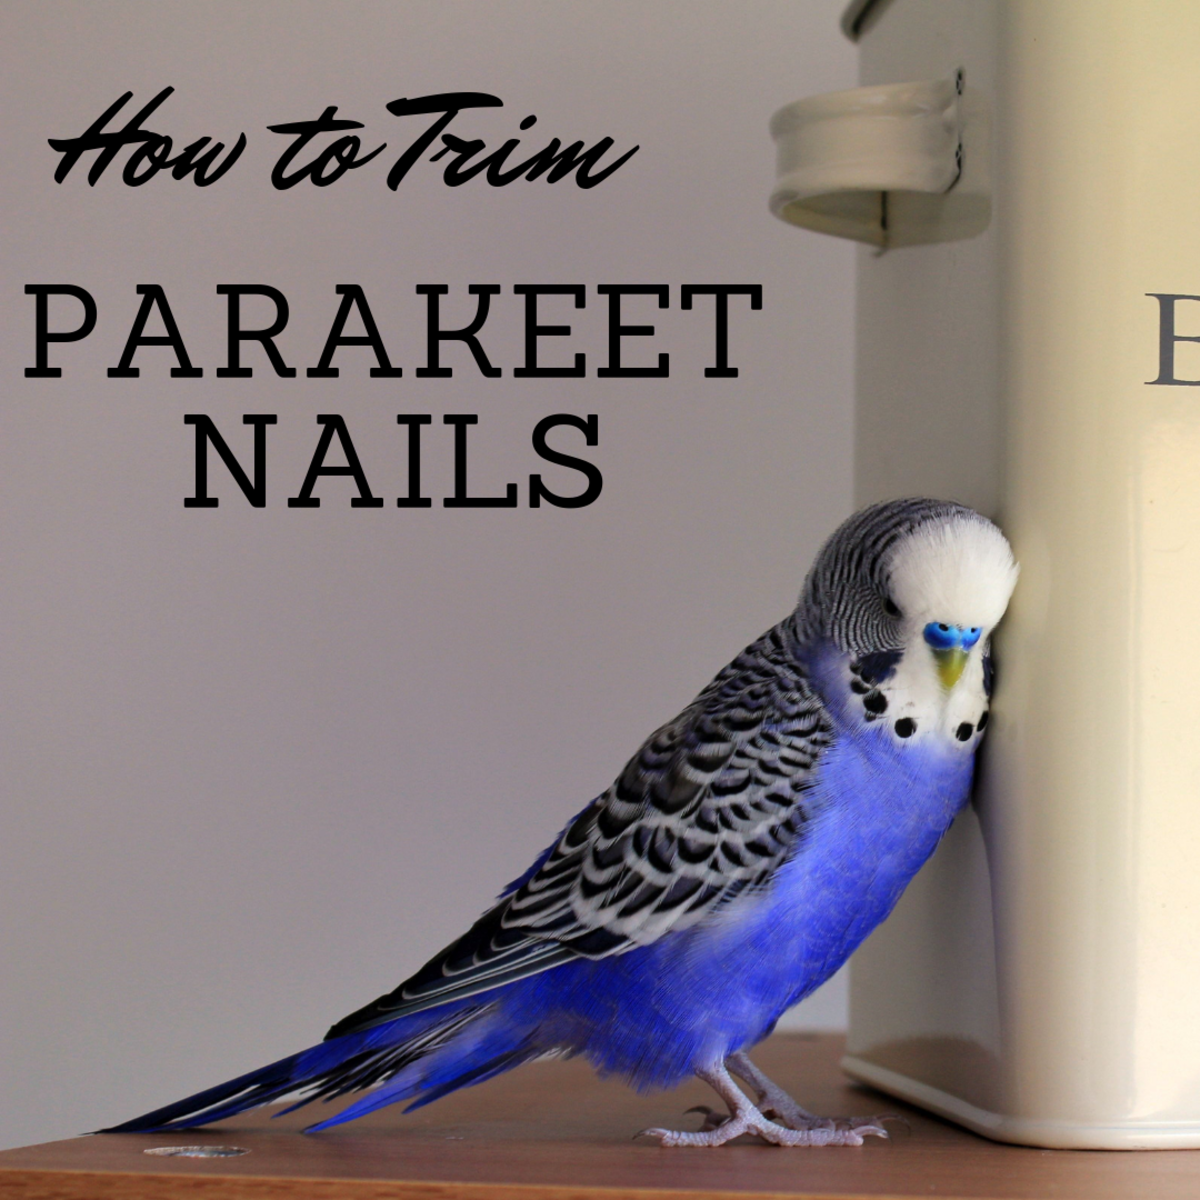 How to Trim Parakeet Nails